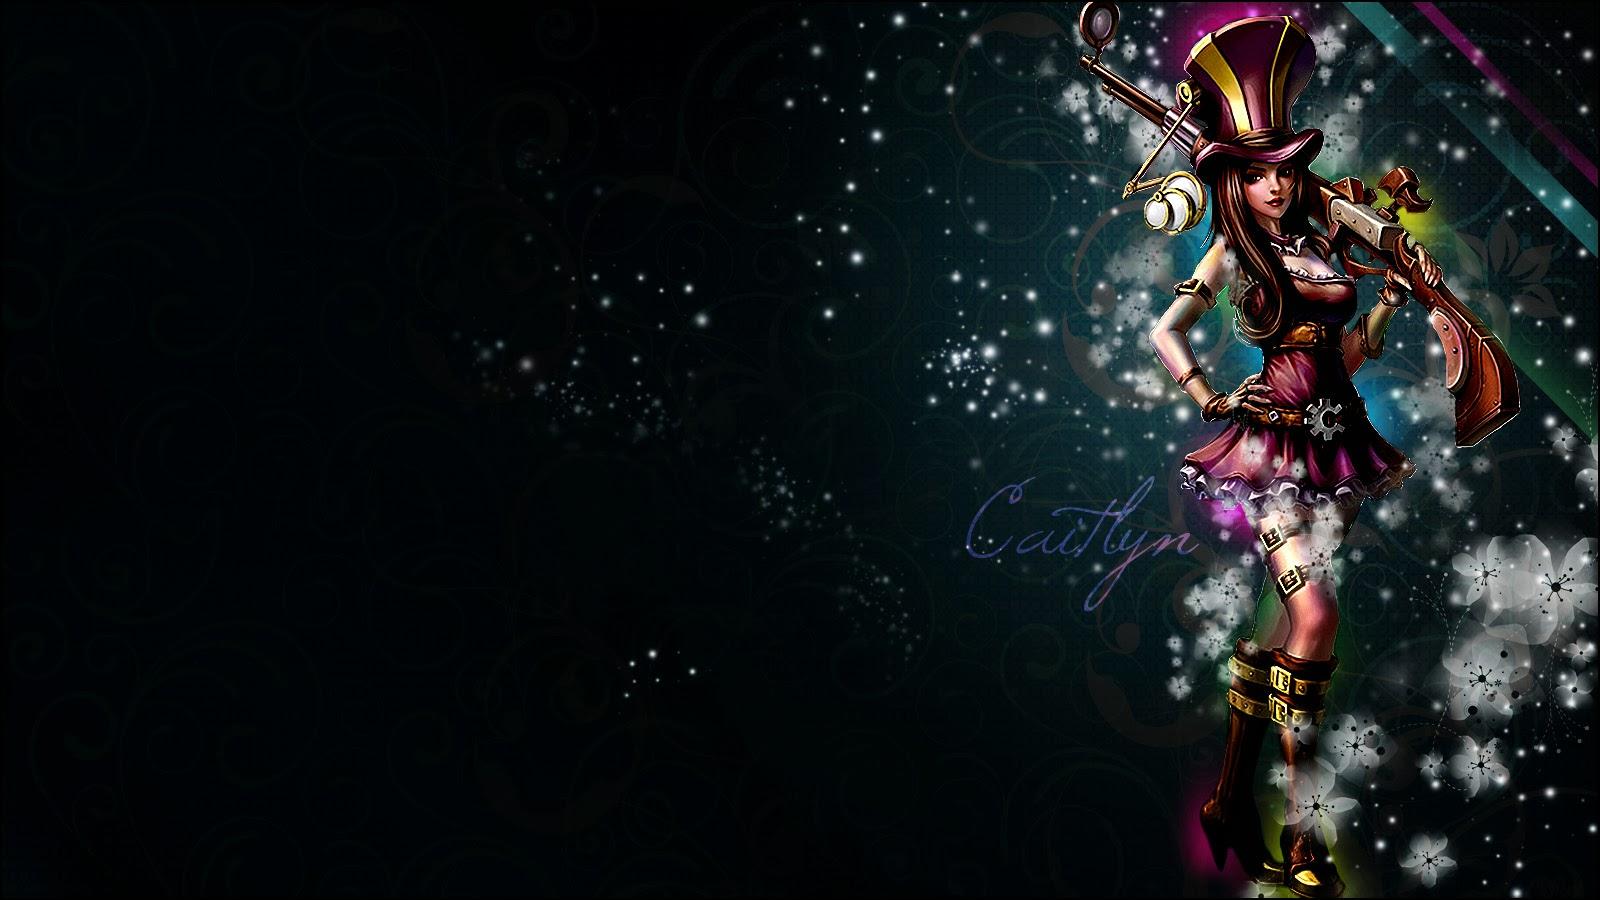 Caitlyn league of legends wallpaper caitlyn desktop wallpaper - League desktop backgrounds ...